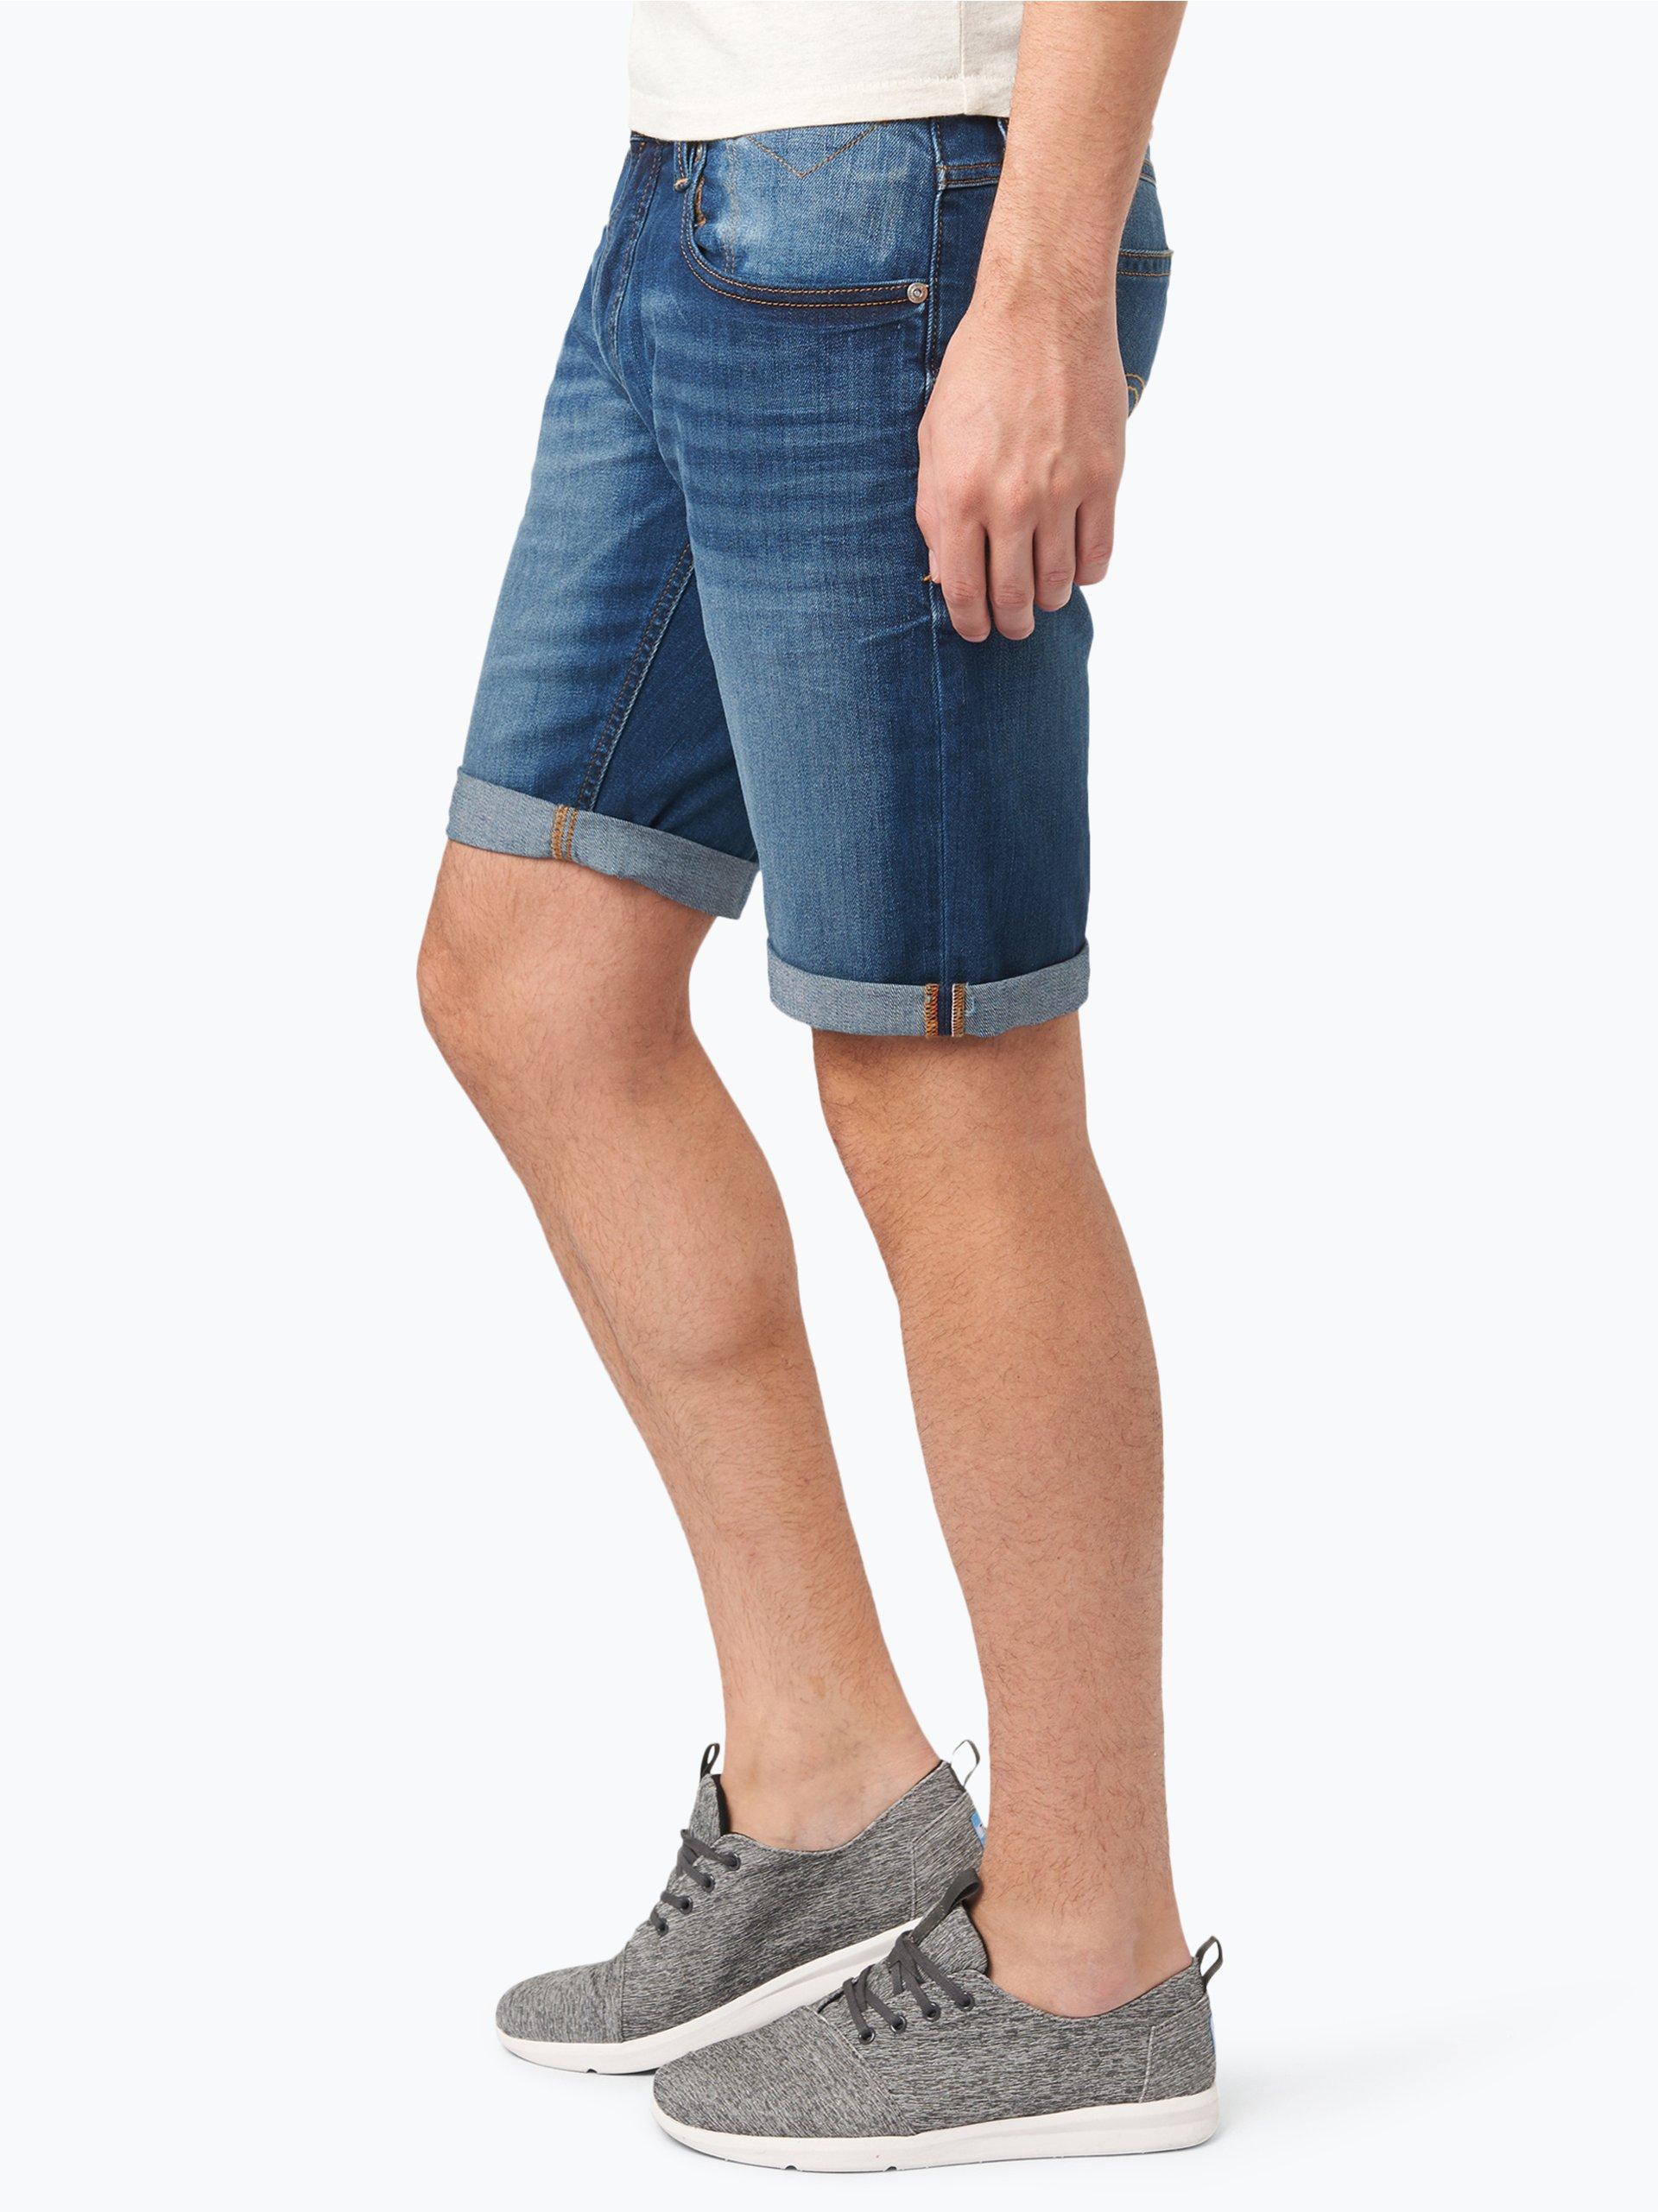 hilfiger denim herren jeans bermuda ronnie hellblau uni online kaufen vangraaf com. Black Bedroom Furniture Sets. Home Design Ideas